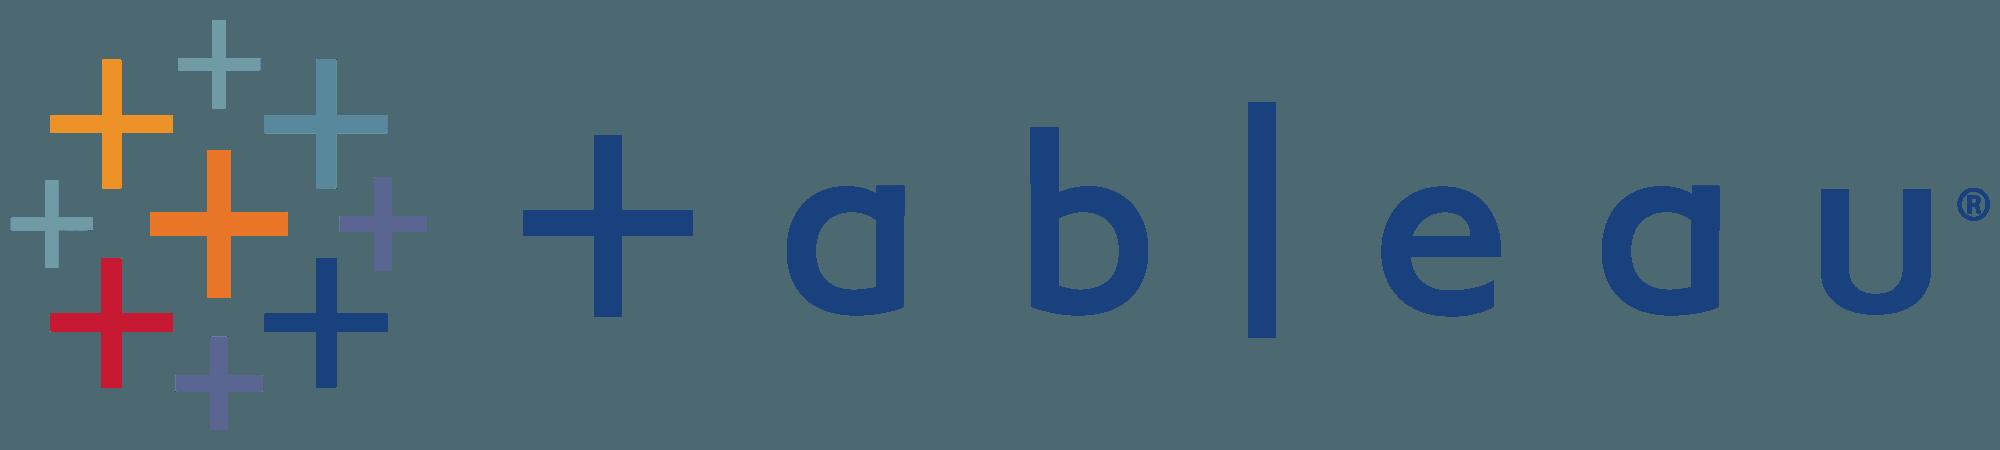 tableaulogo_highres